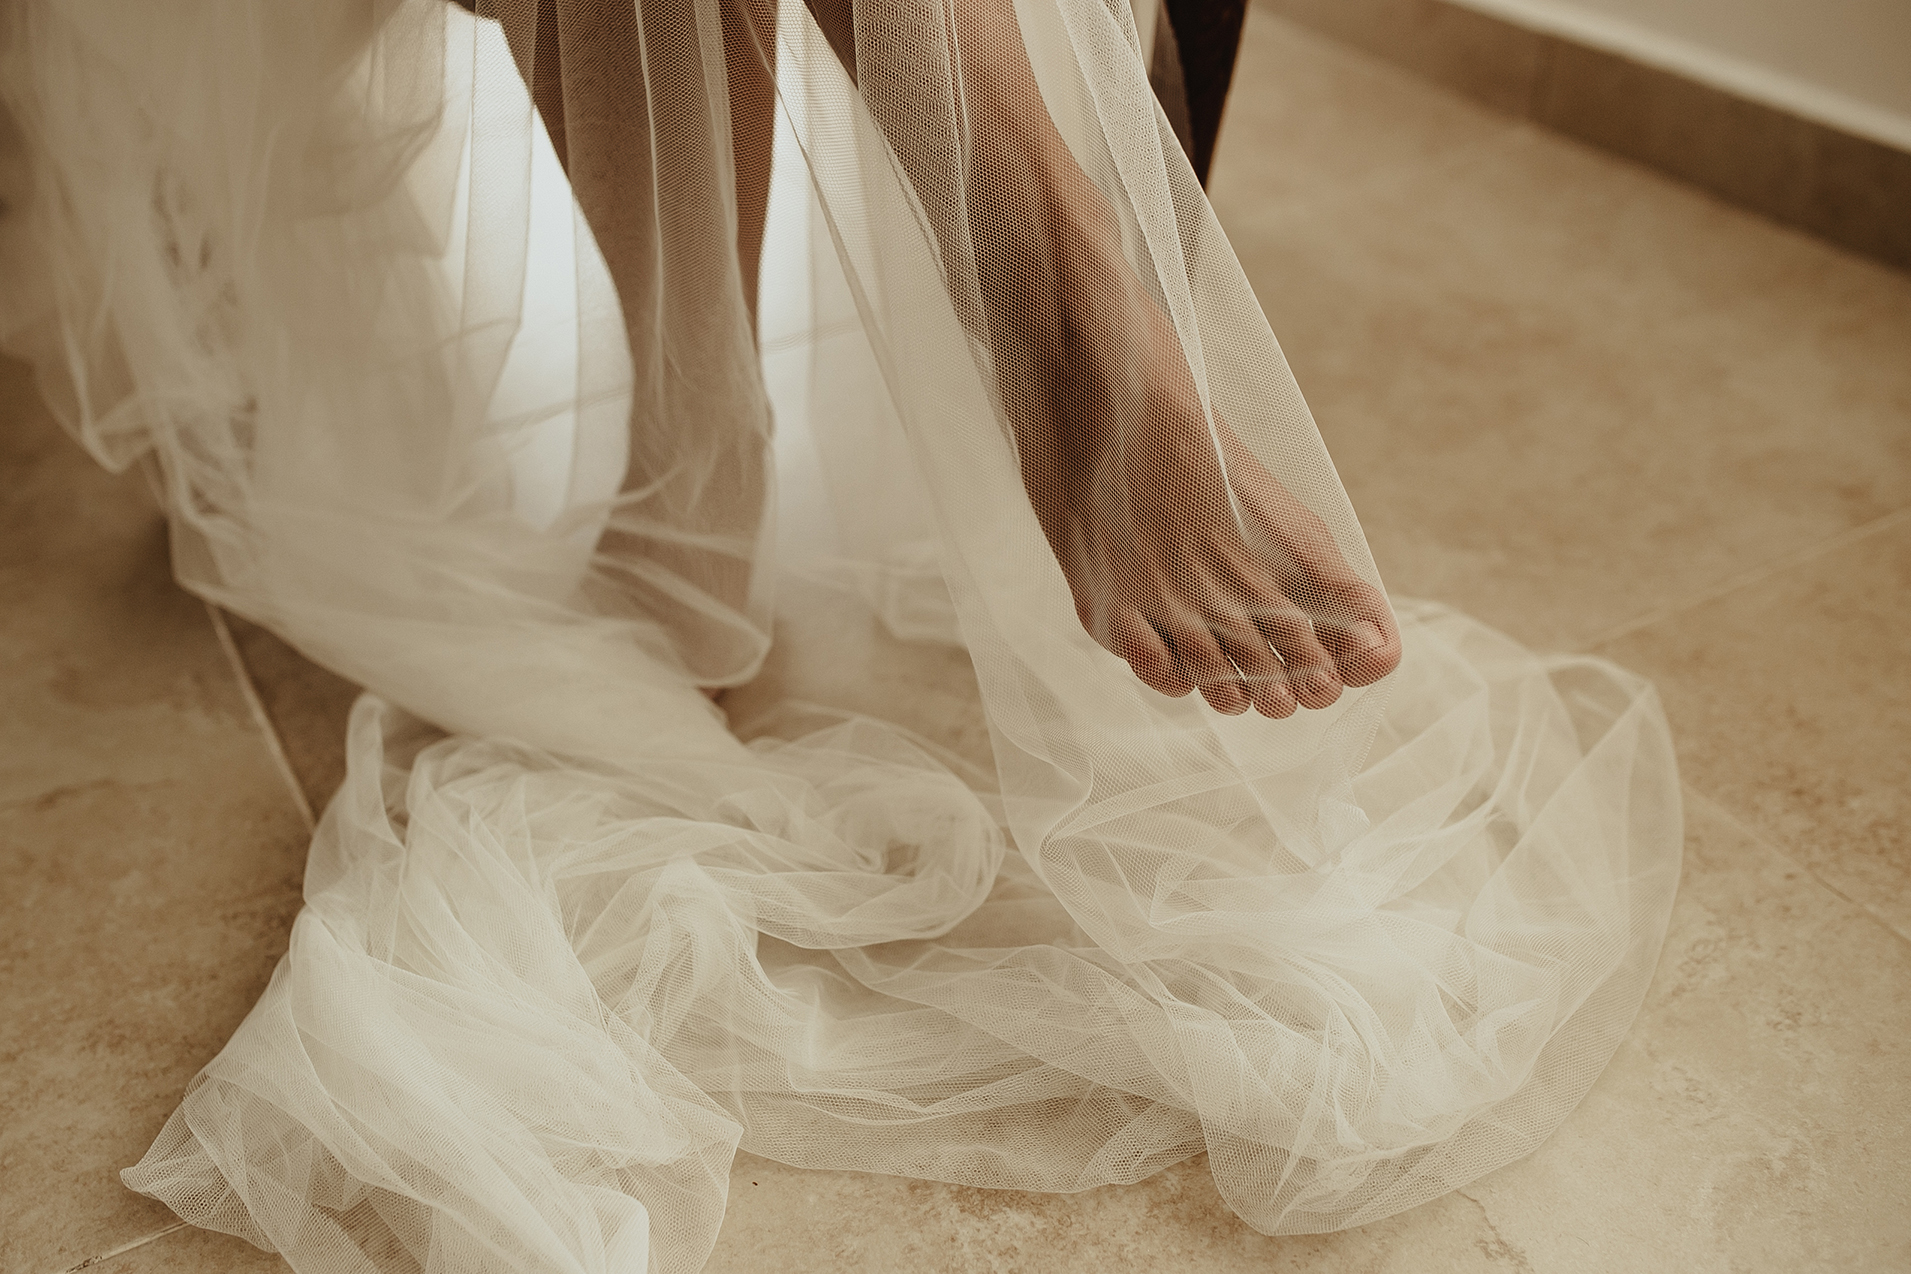 0081F&Yslide_WeddingDstination_MeridaYucatan_HaciendasMerida_BodasMexico_BodasYucatan_Boda_Destino.jpg